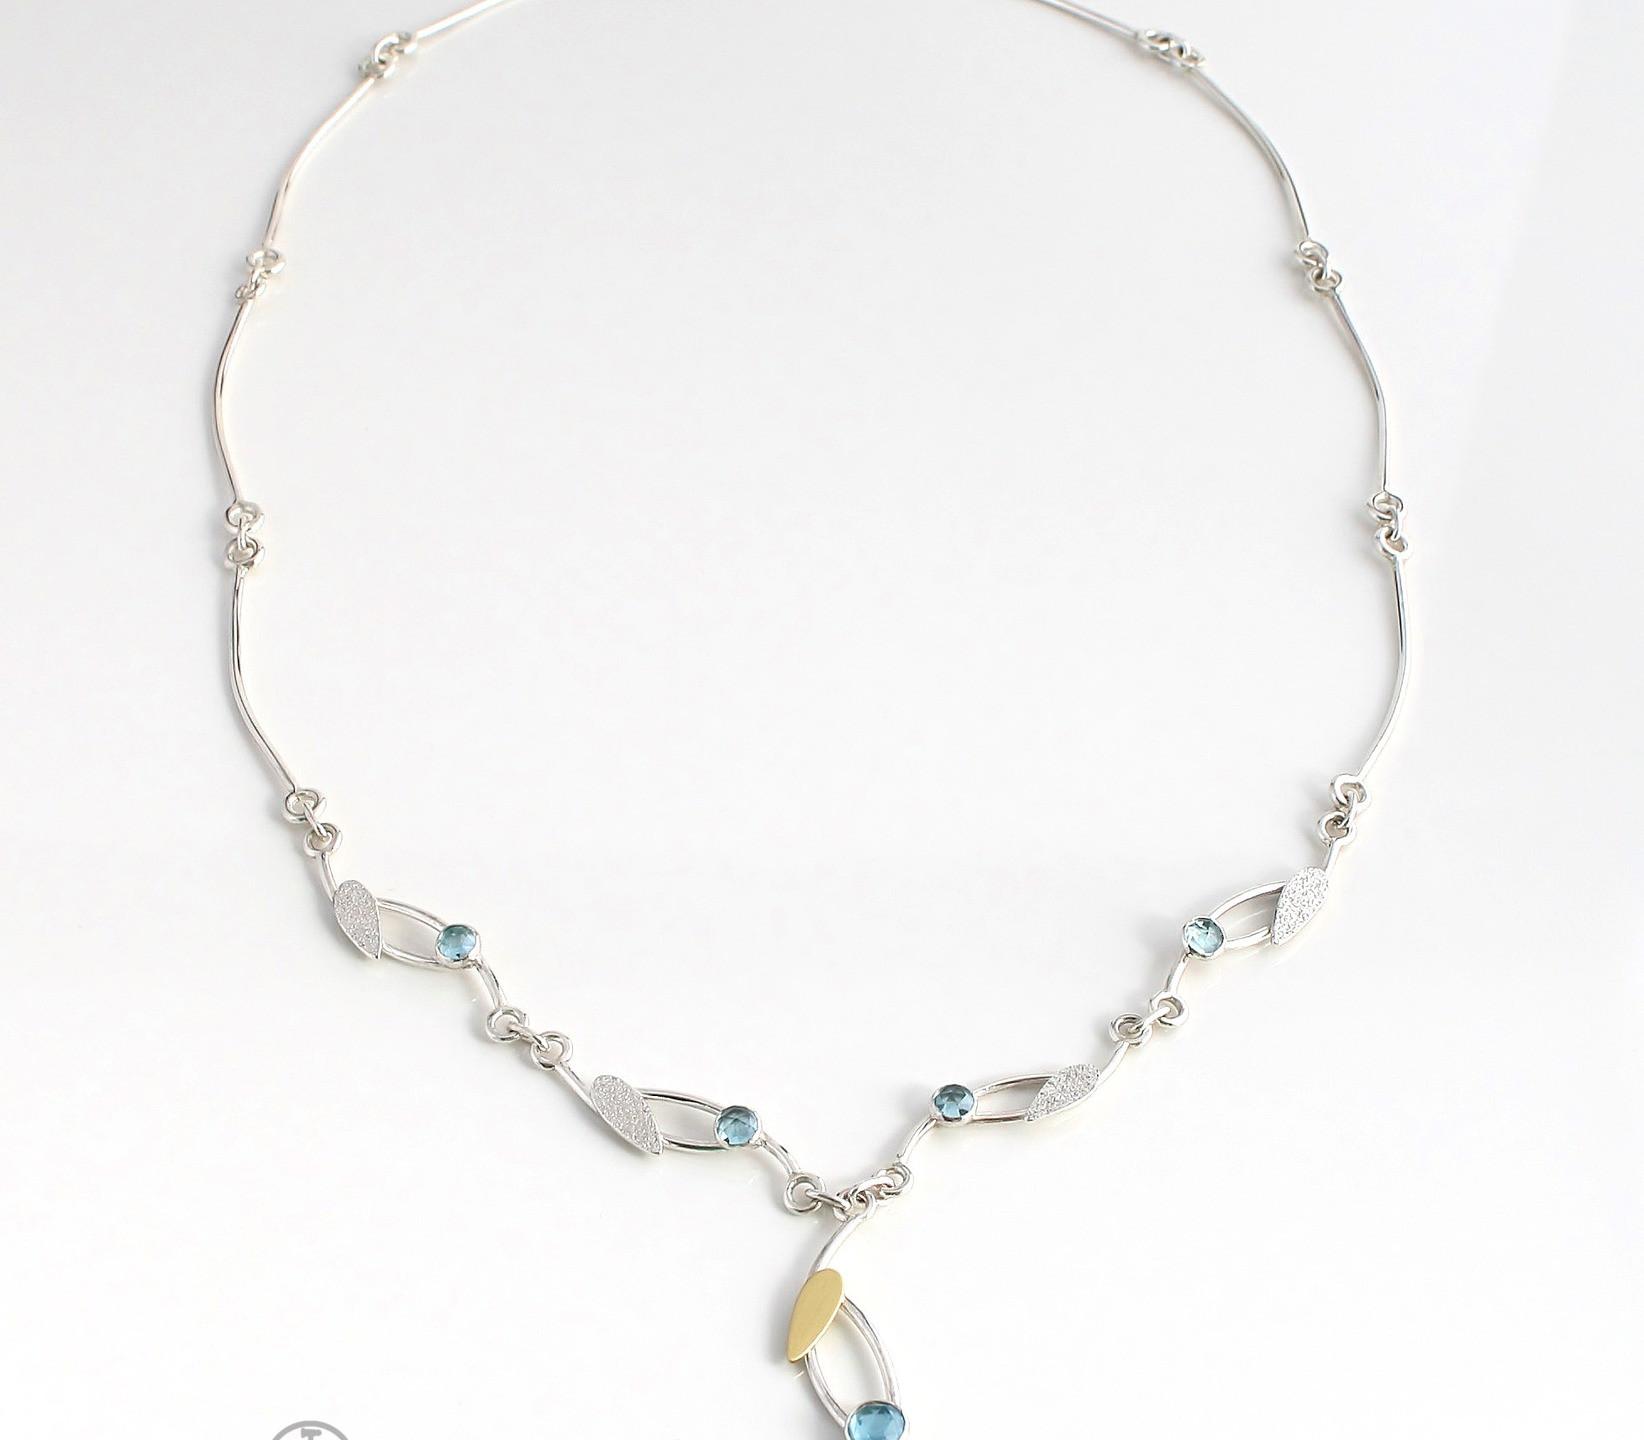 BLUE TOPAZ NECKLACE STERLING SILVER 18K GOLD